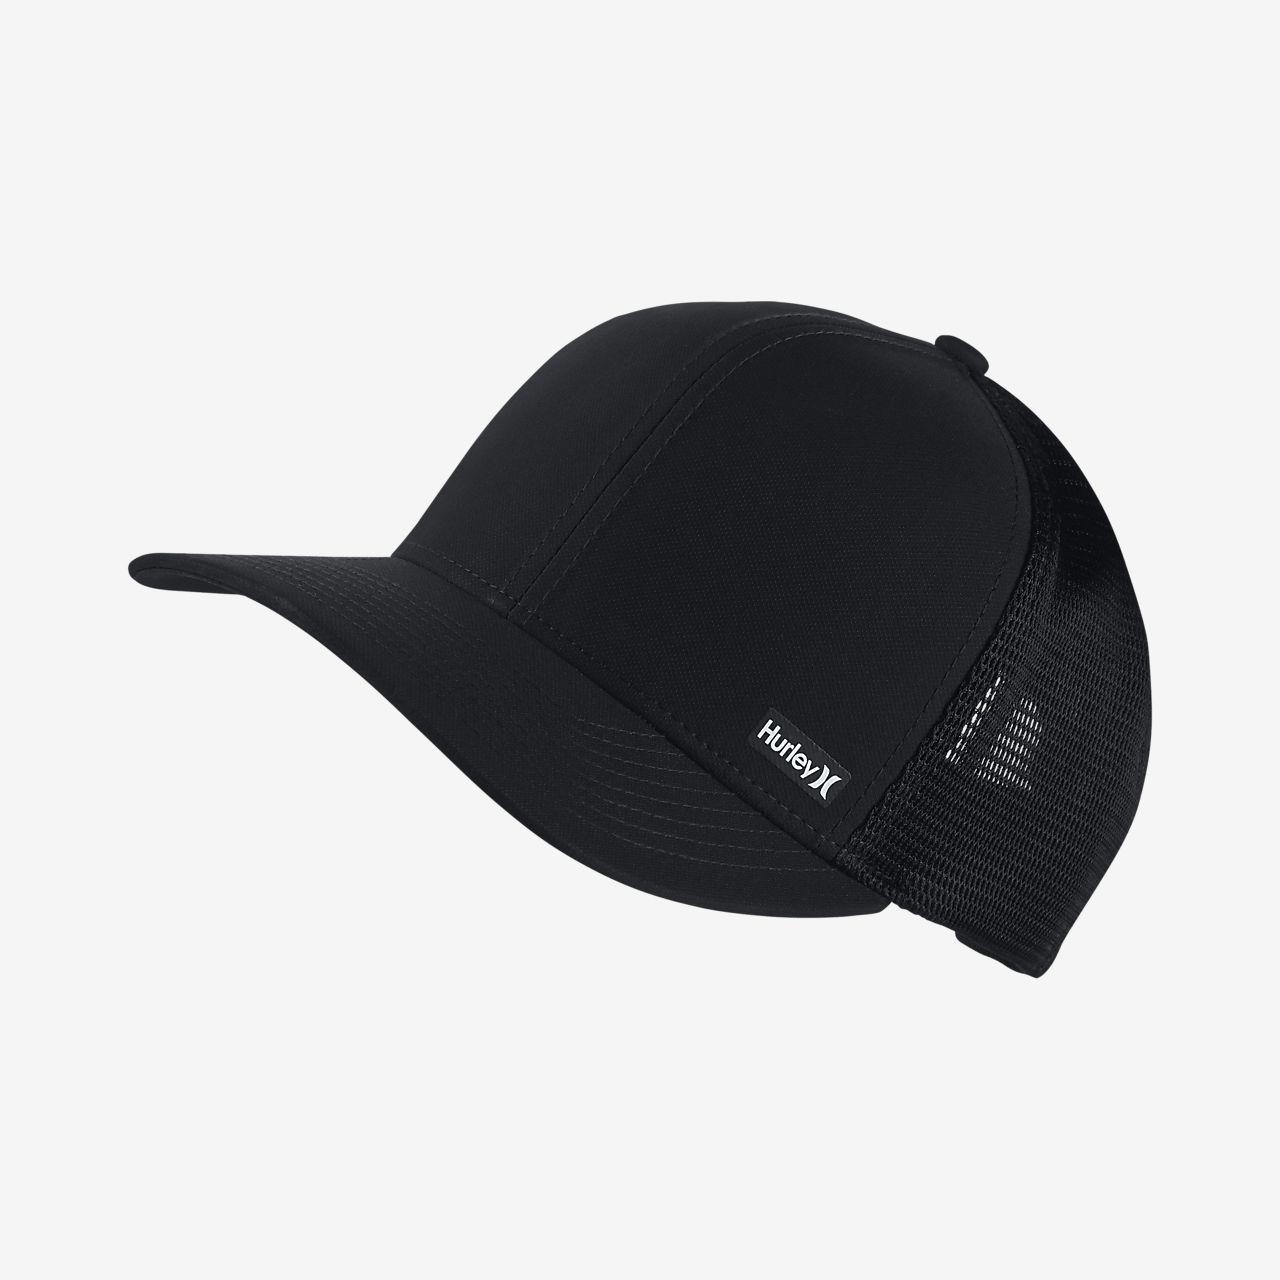 Hurley League verstellbare Cap